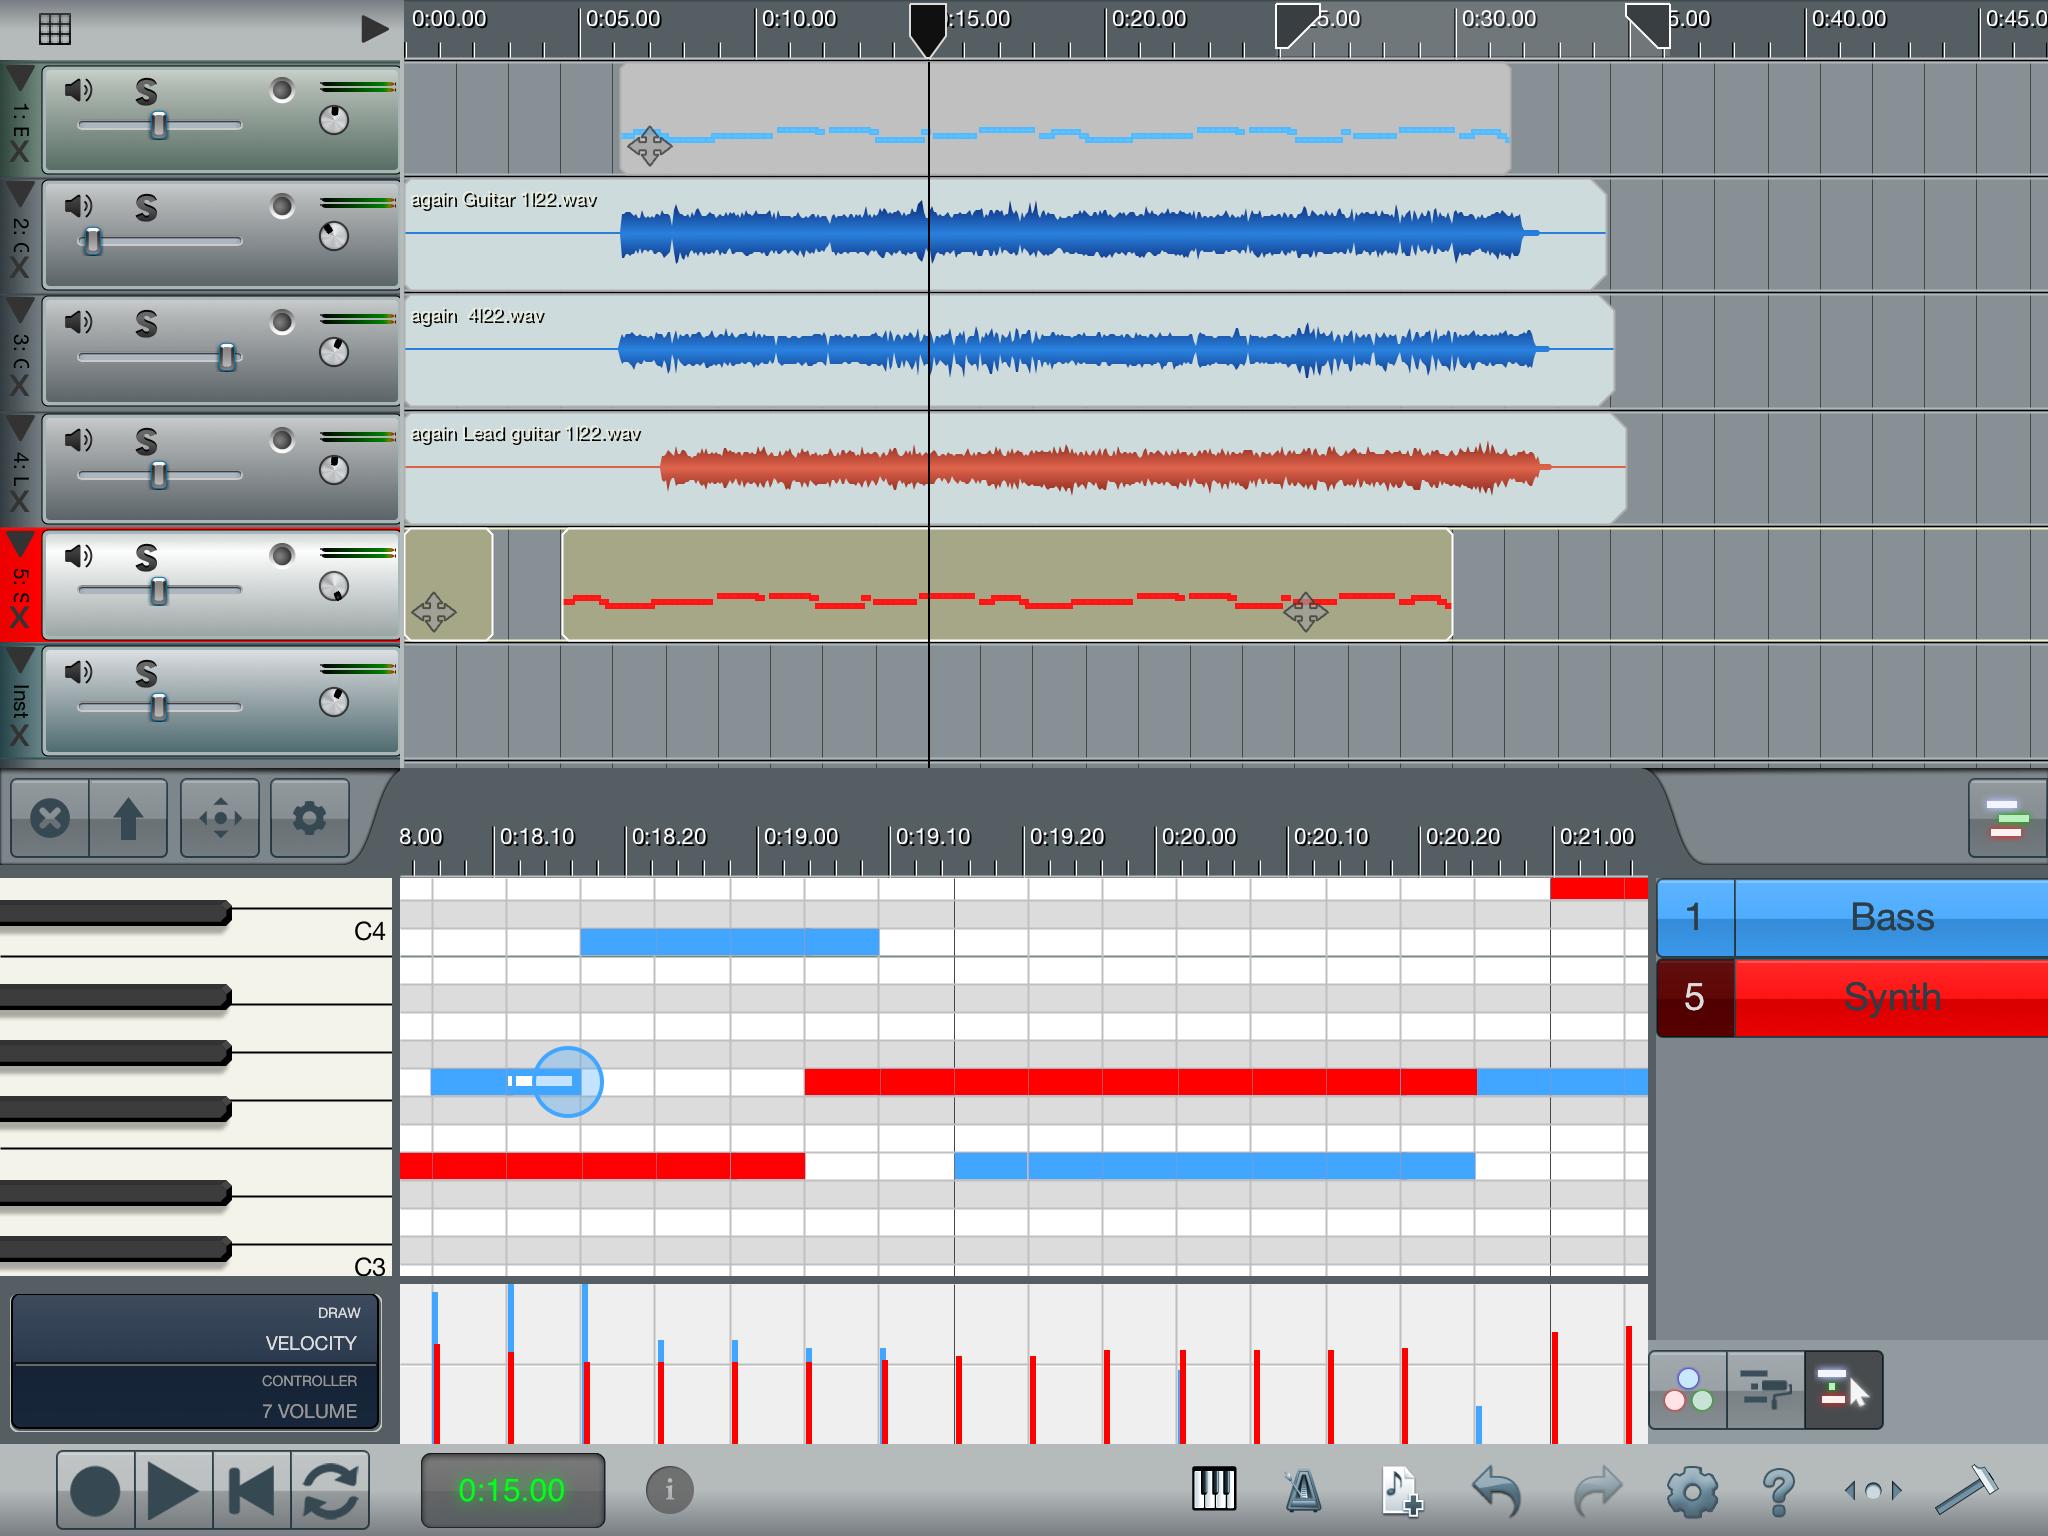 Pro Audio on the iPad - Recording multichannel 24 bit audio